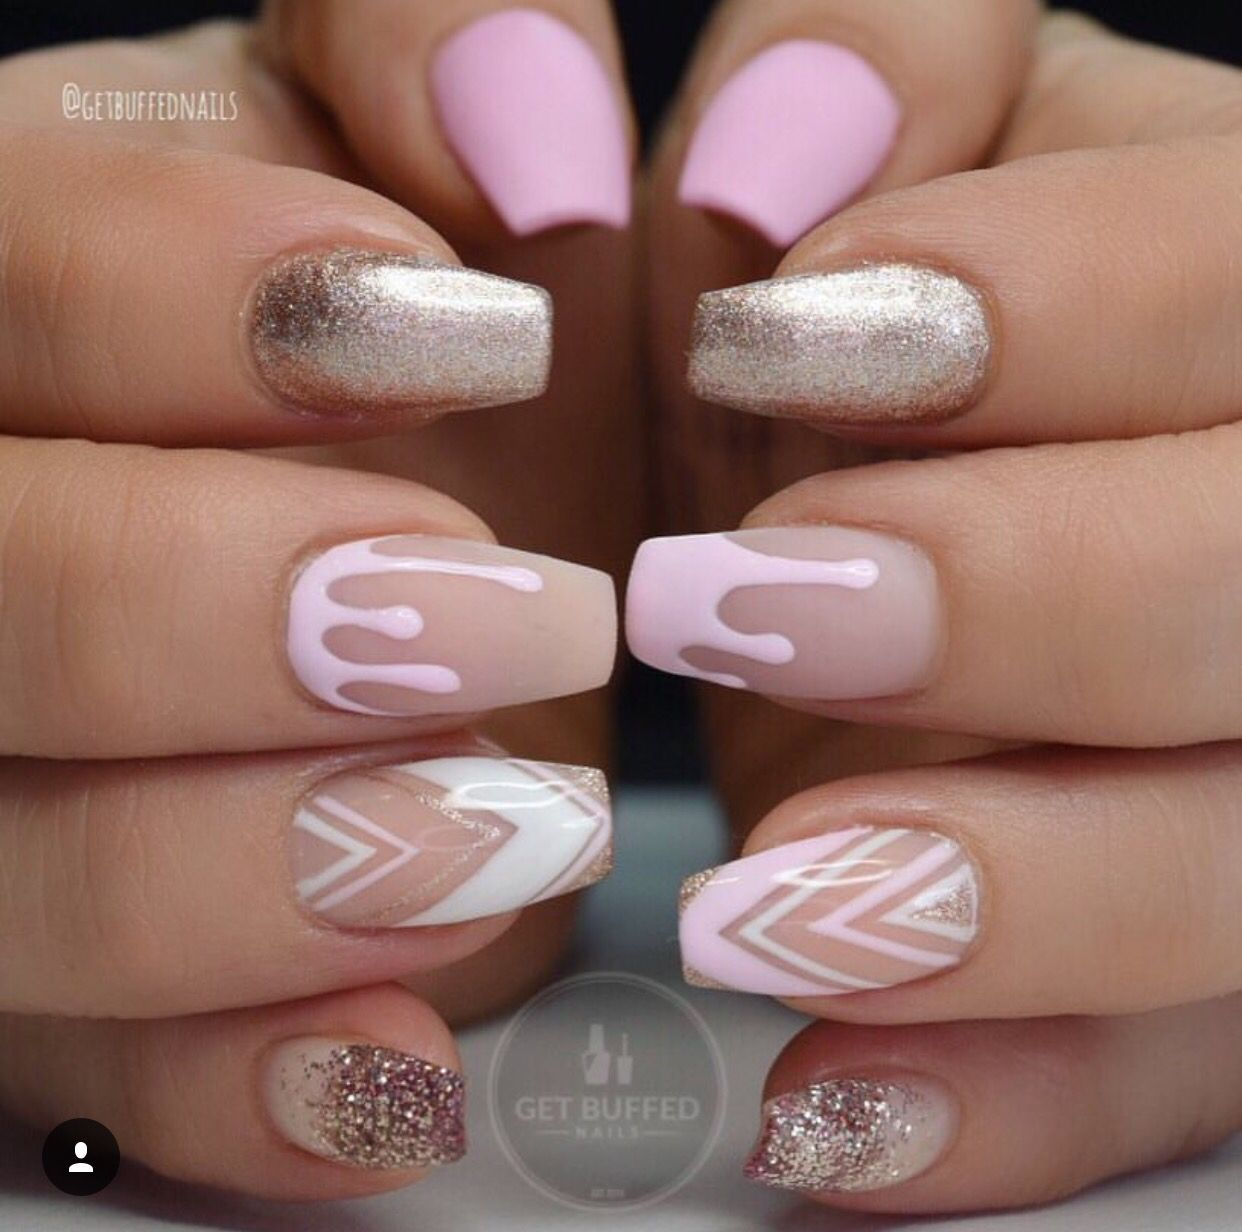 Pin by Megan Sample on Nails   Pinterest